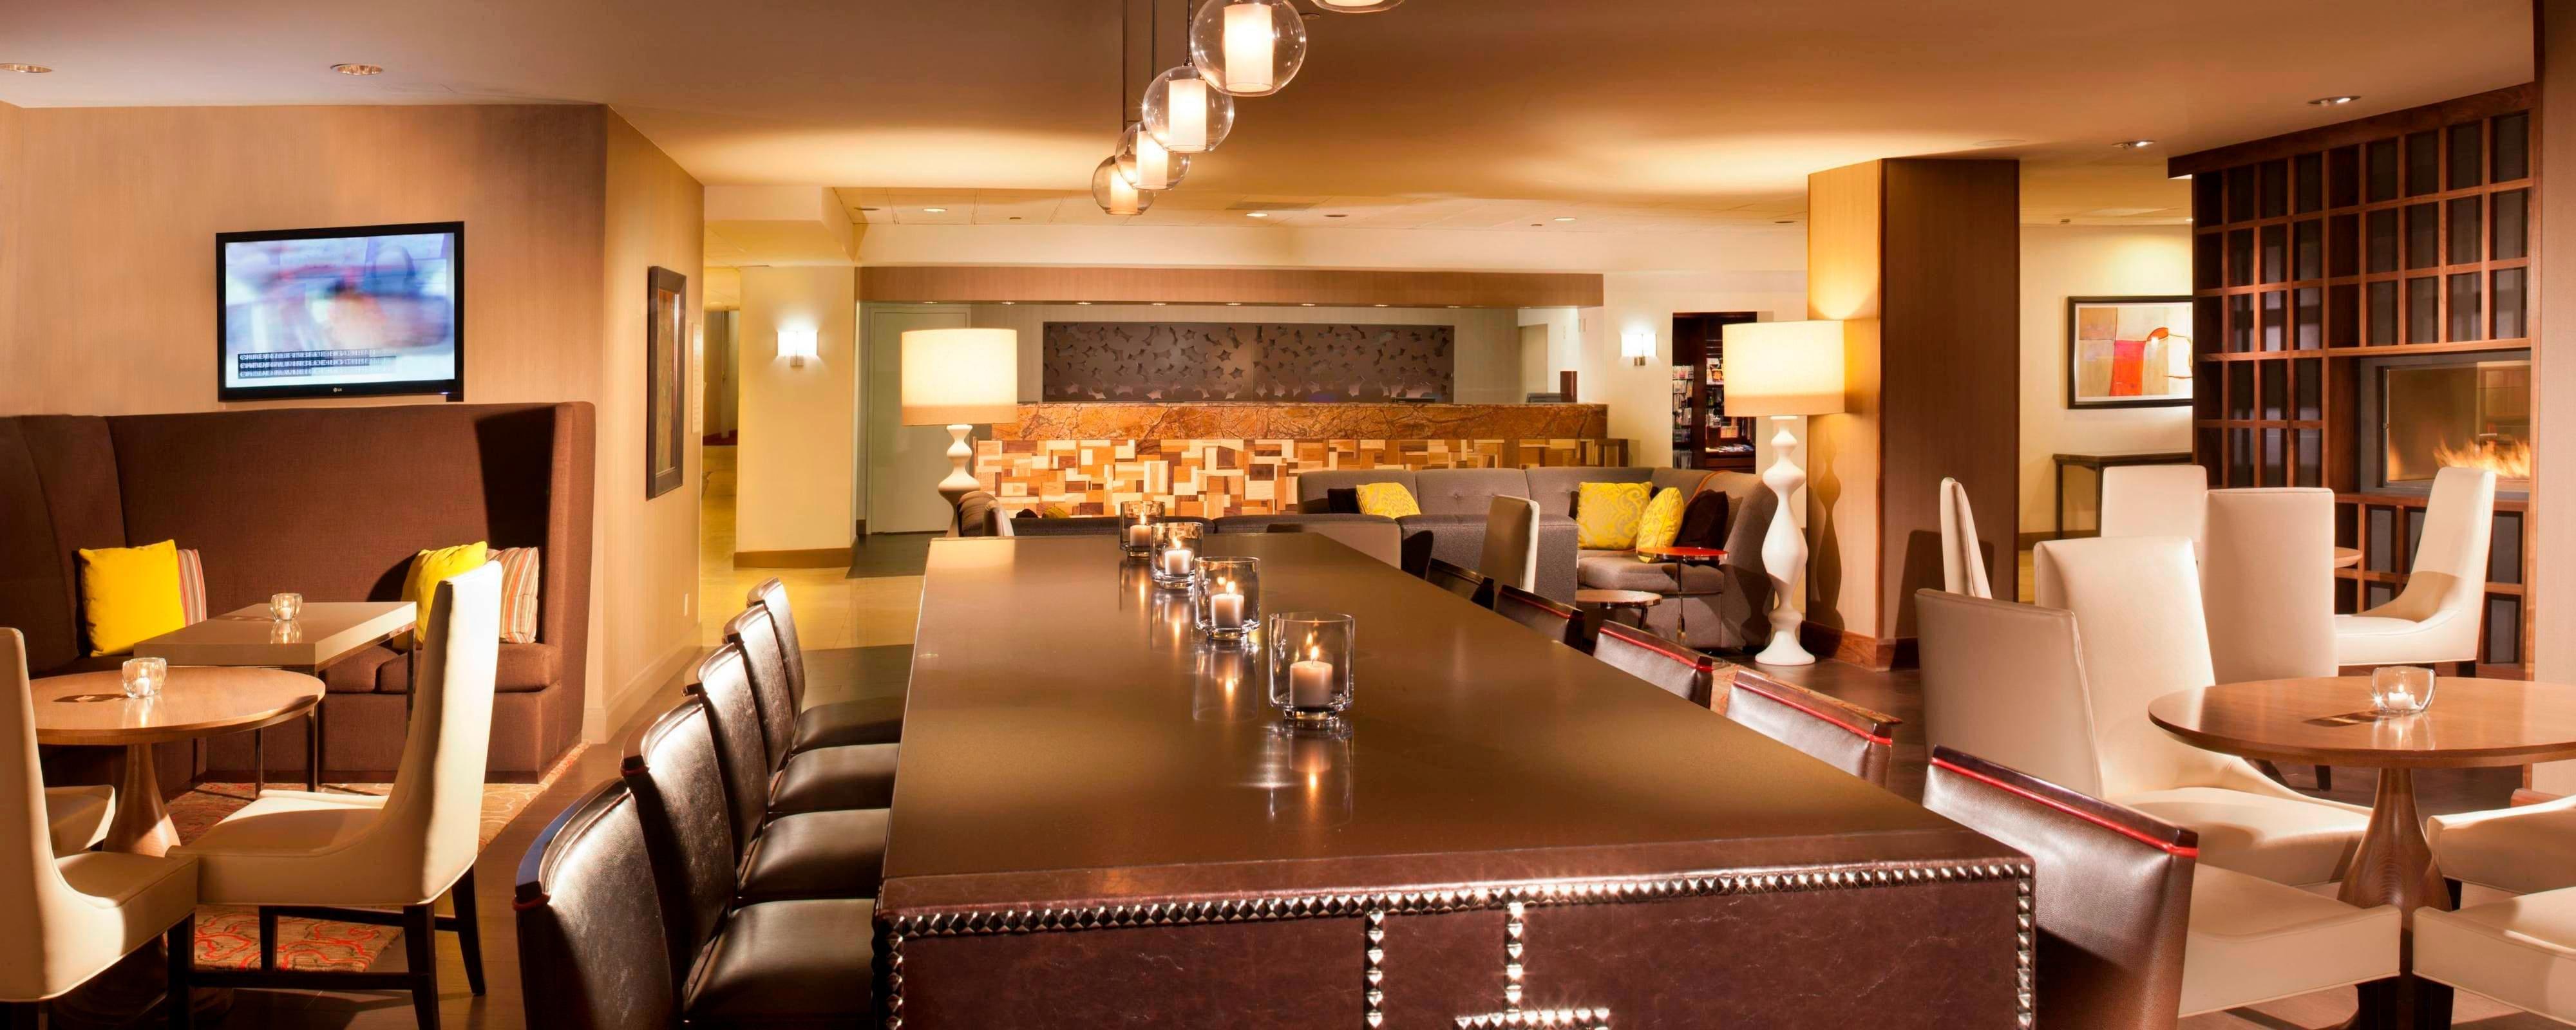 Omaha Restaurants   Omaha Marriott